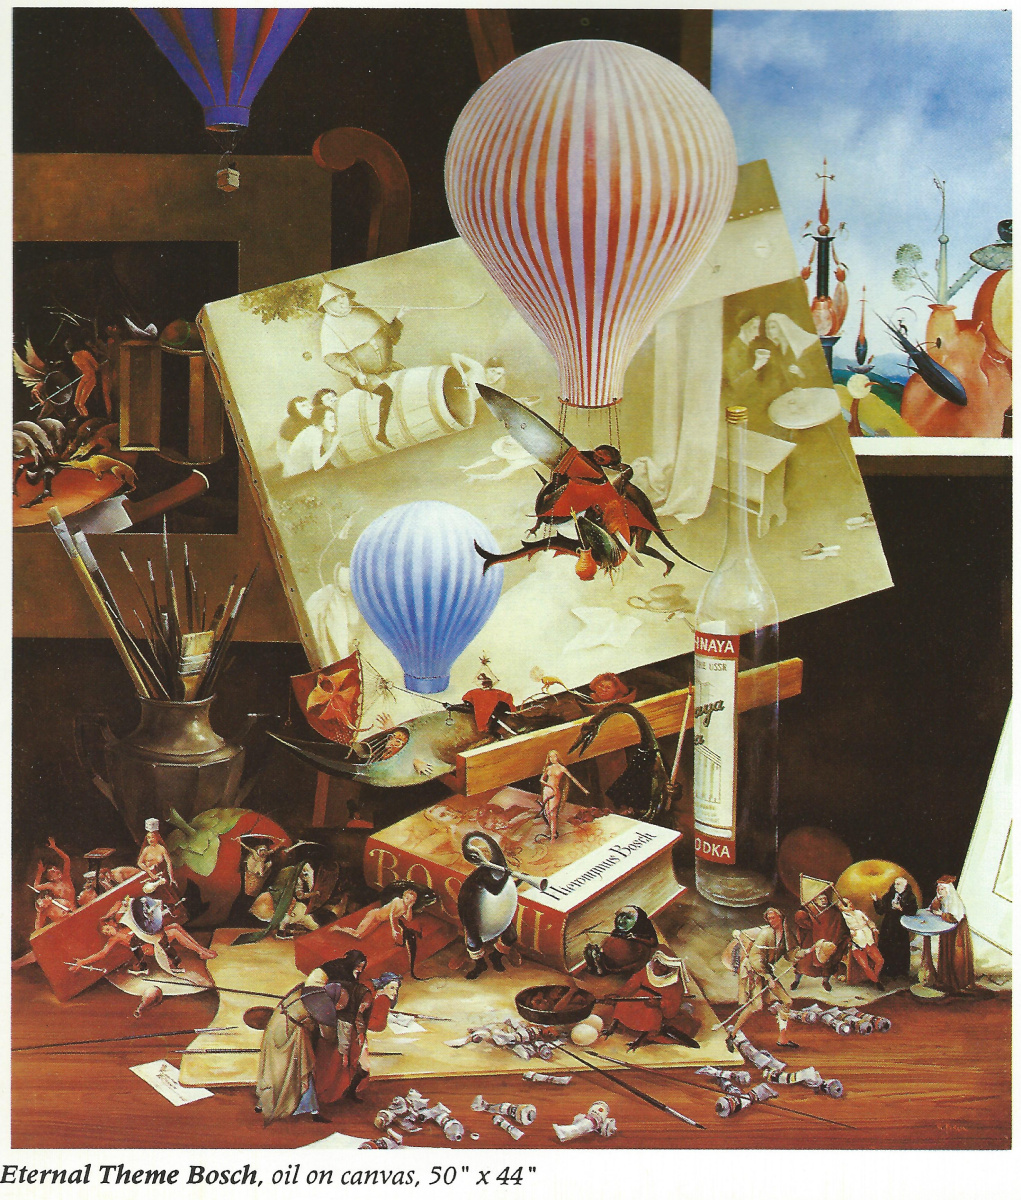 Vladimir (Vladimir) Mikhailovich Ryklin (Ryklin). Bosch. The Eternal Theme